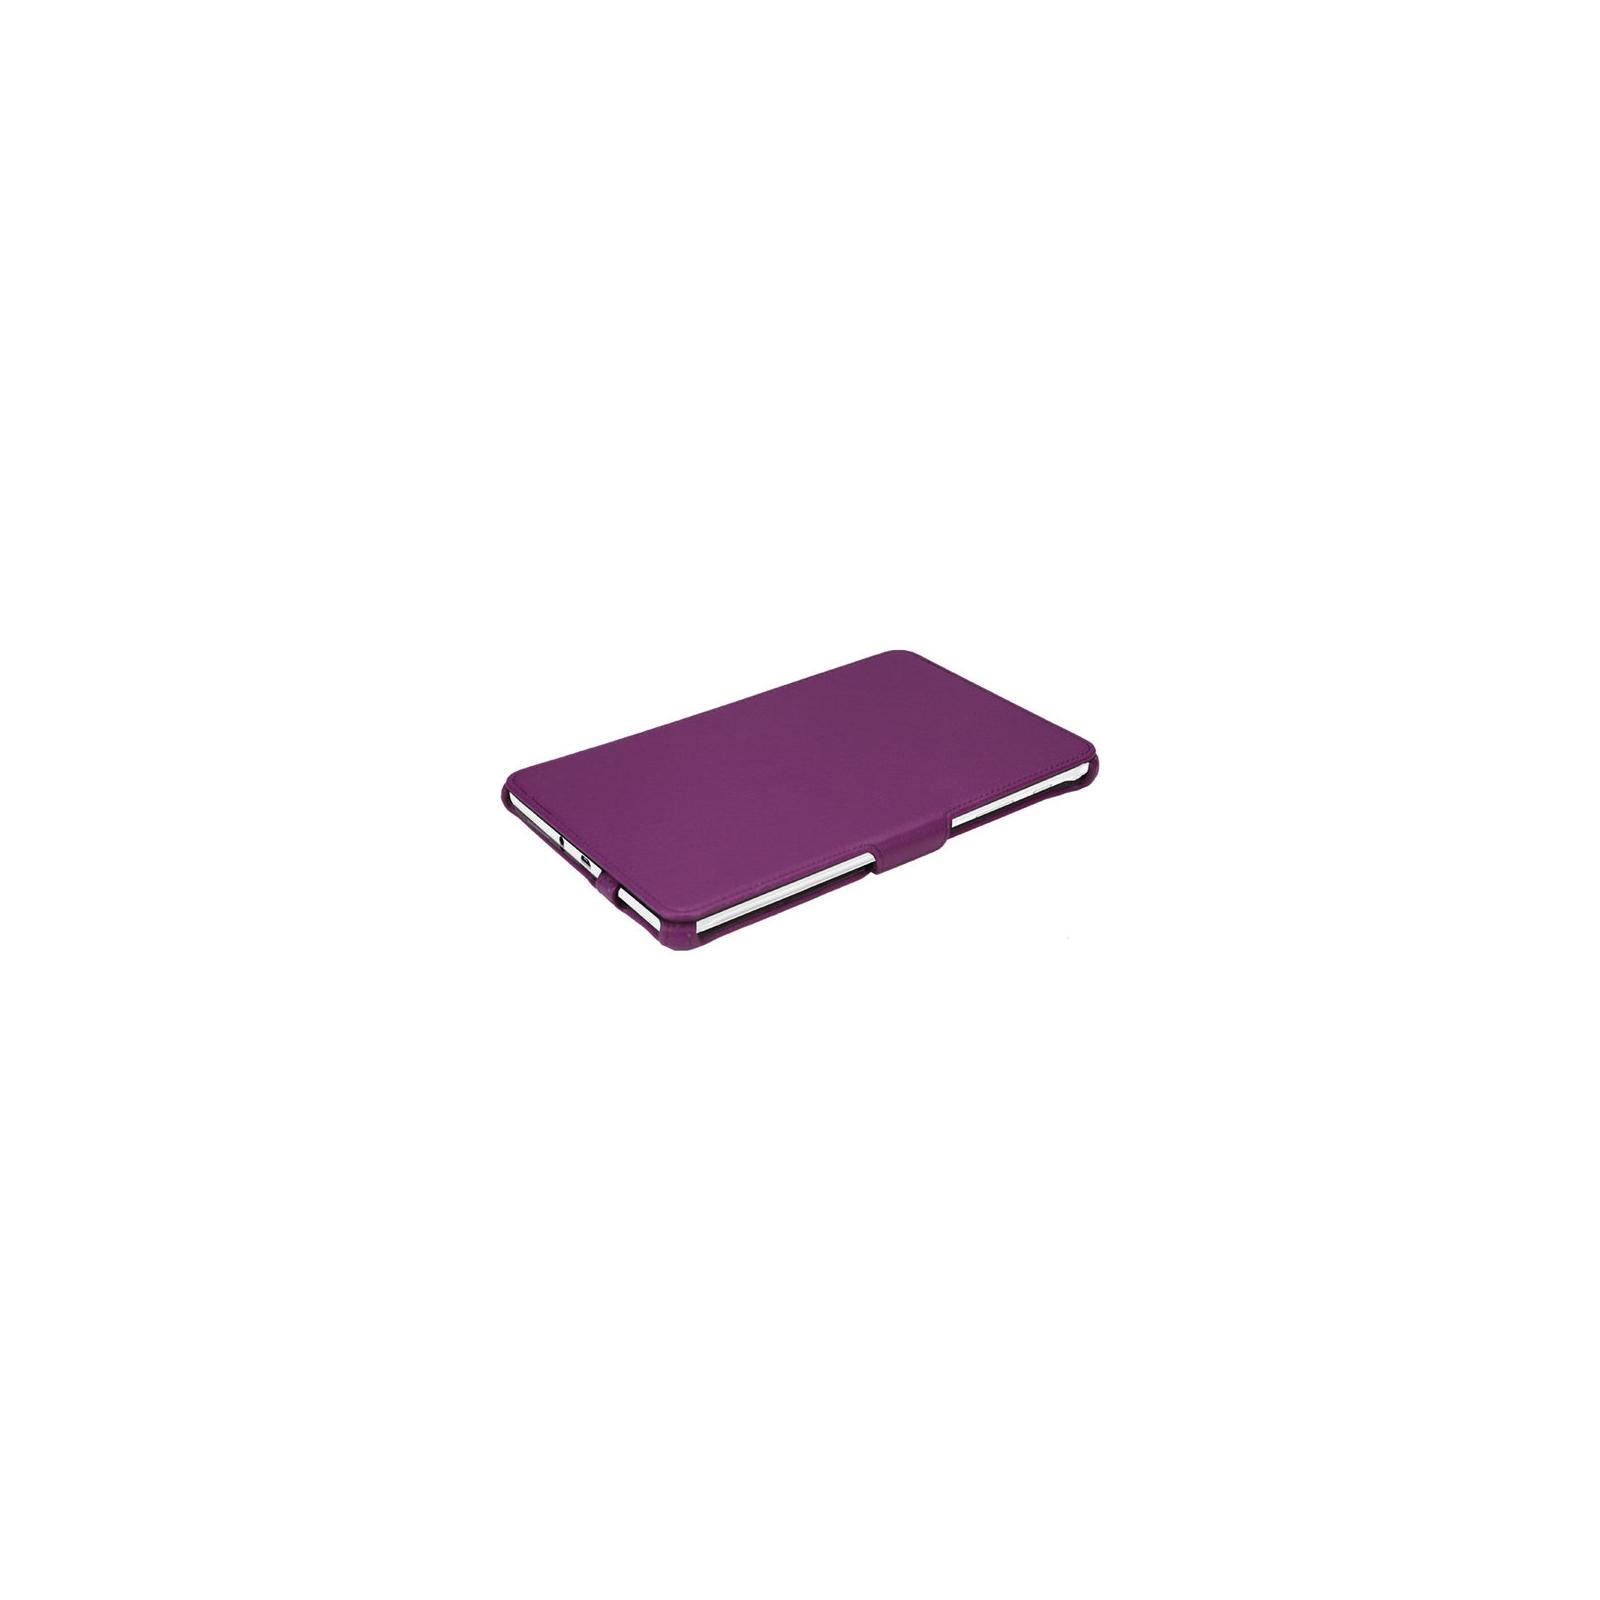 Чехол для планшета AirOn для Samsung Galaxy Tab E 9.6 vio (4822352776329) изображение 3